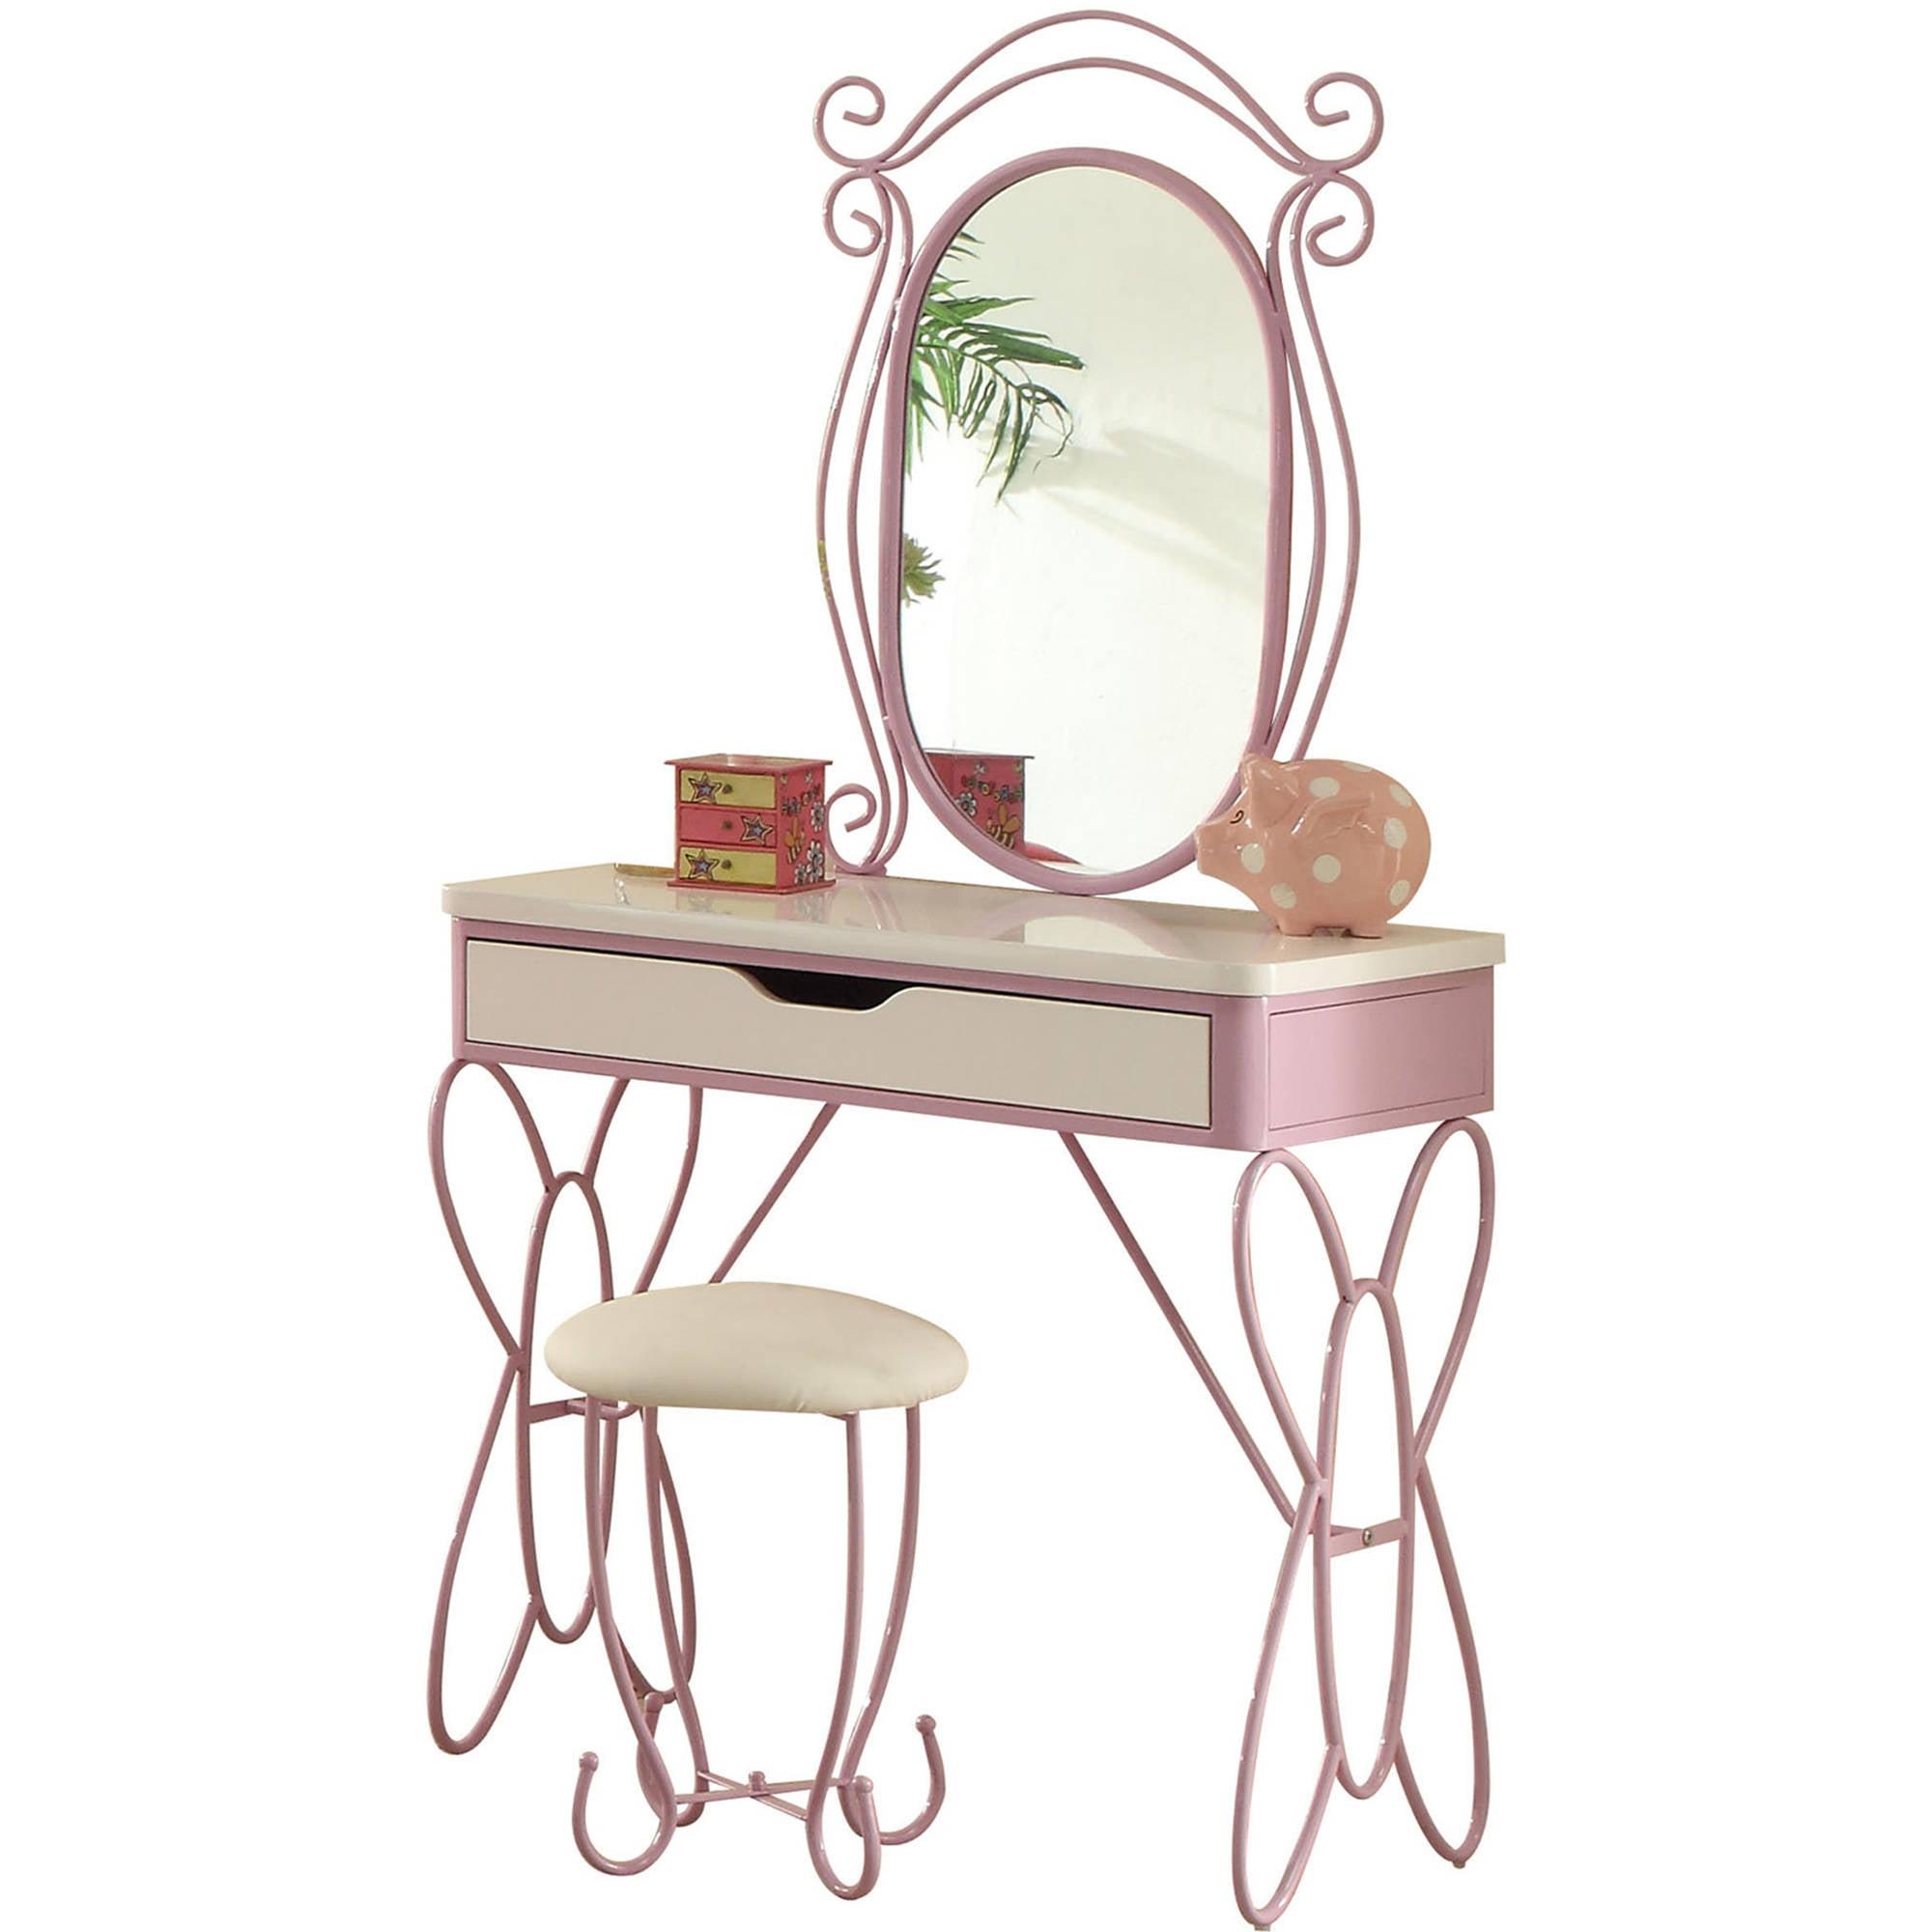 Acme Priya II Vanity Desk and Mirror, White and Light Purple by Acme Furniture